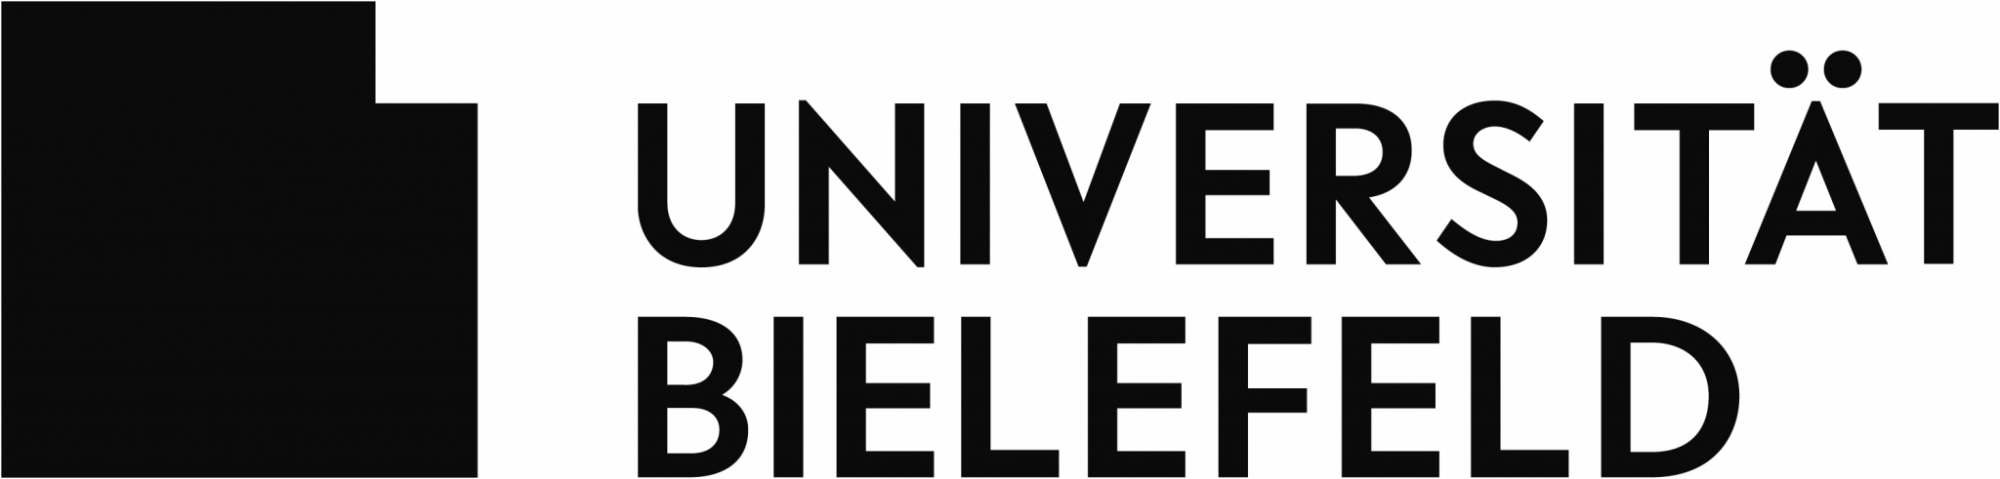 Logo of the Bielefeld University